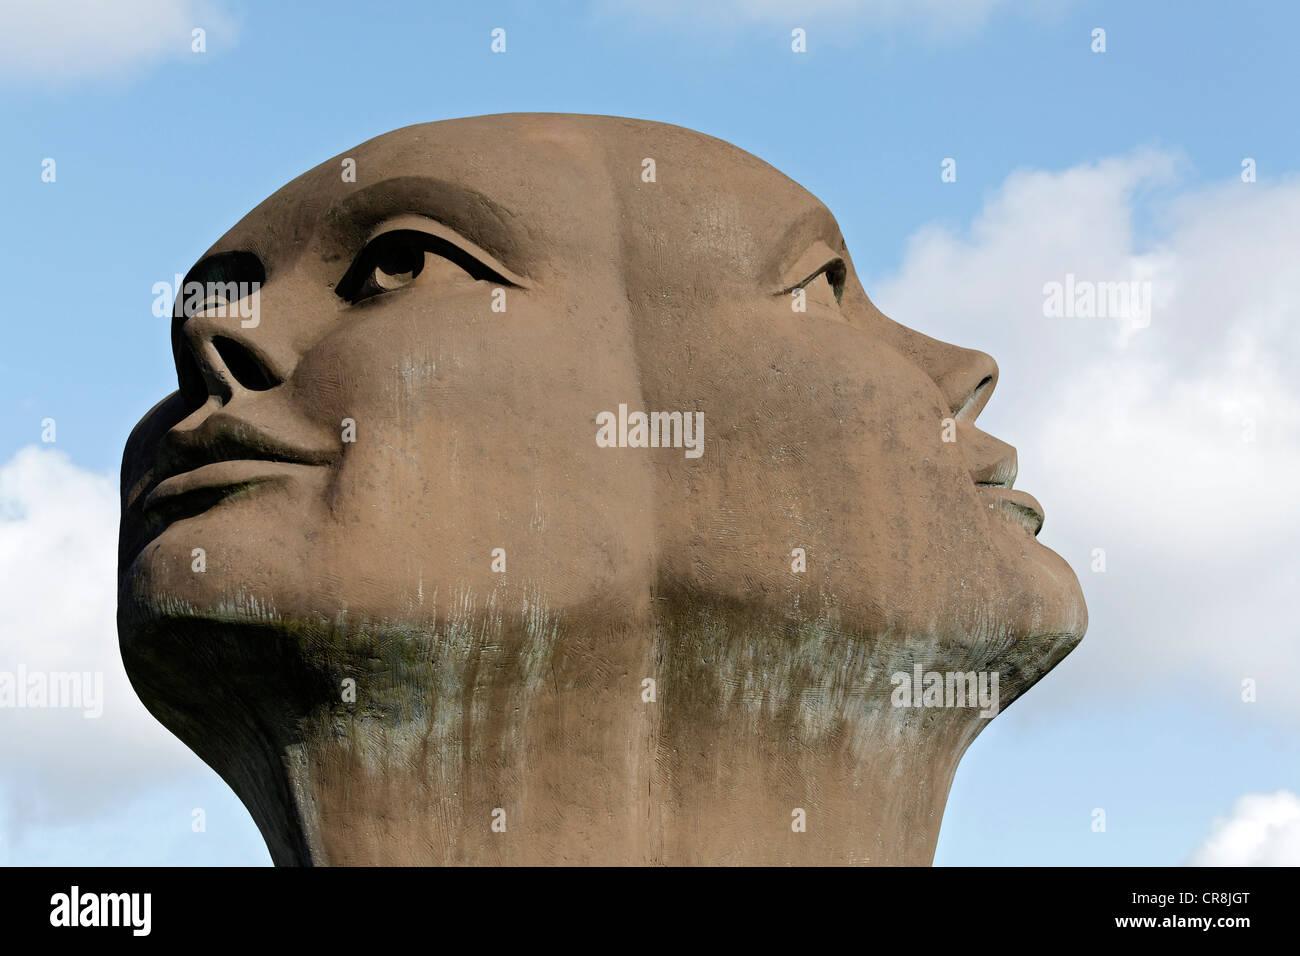 Sculpture, Blik van Licht, Look of Light, by Charles Delporte, depiction of the head of Janus, Damme, West Flanders, - Stock Image